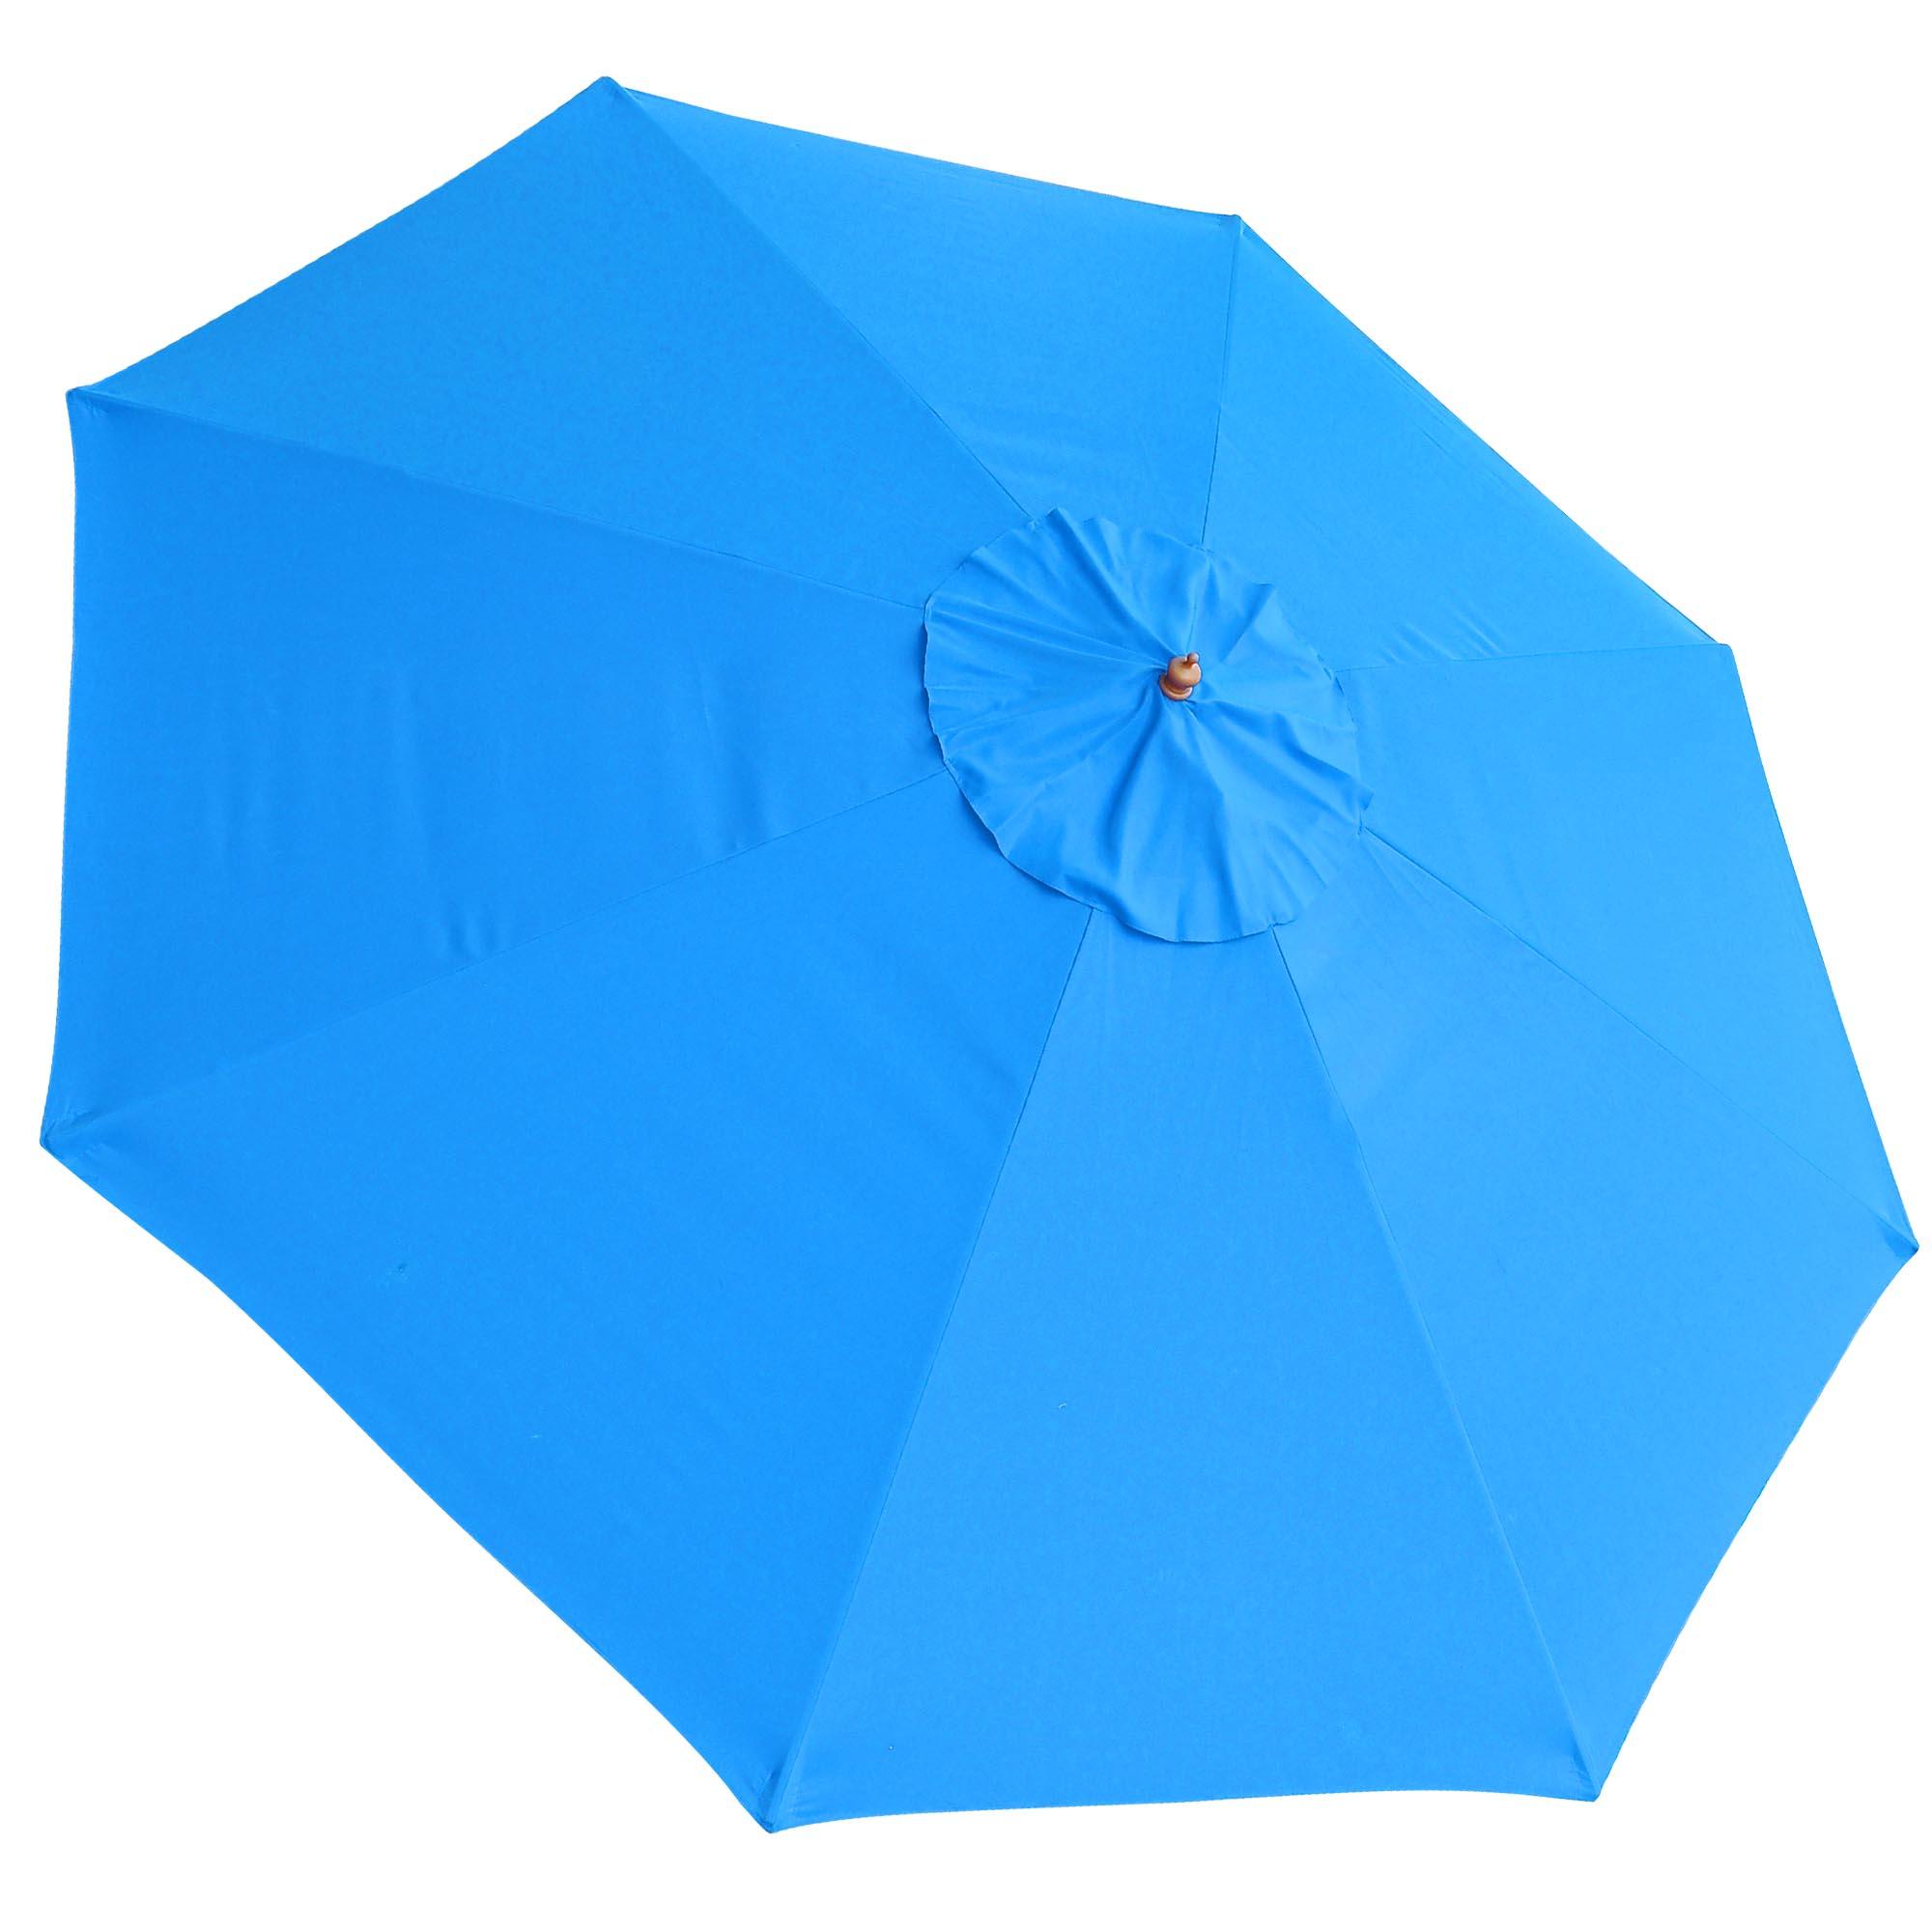 8 9 10 13 Umbrella Replacement Canopy 8 Rib Outdoor